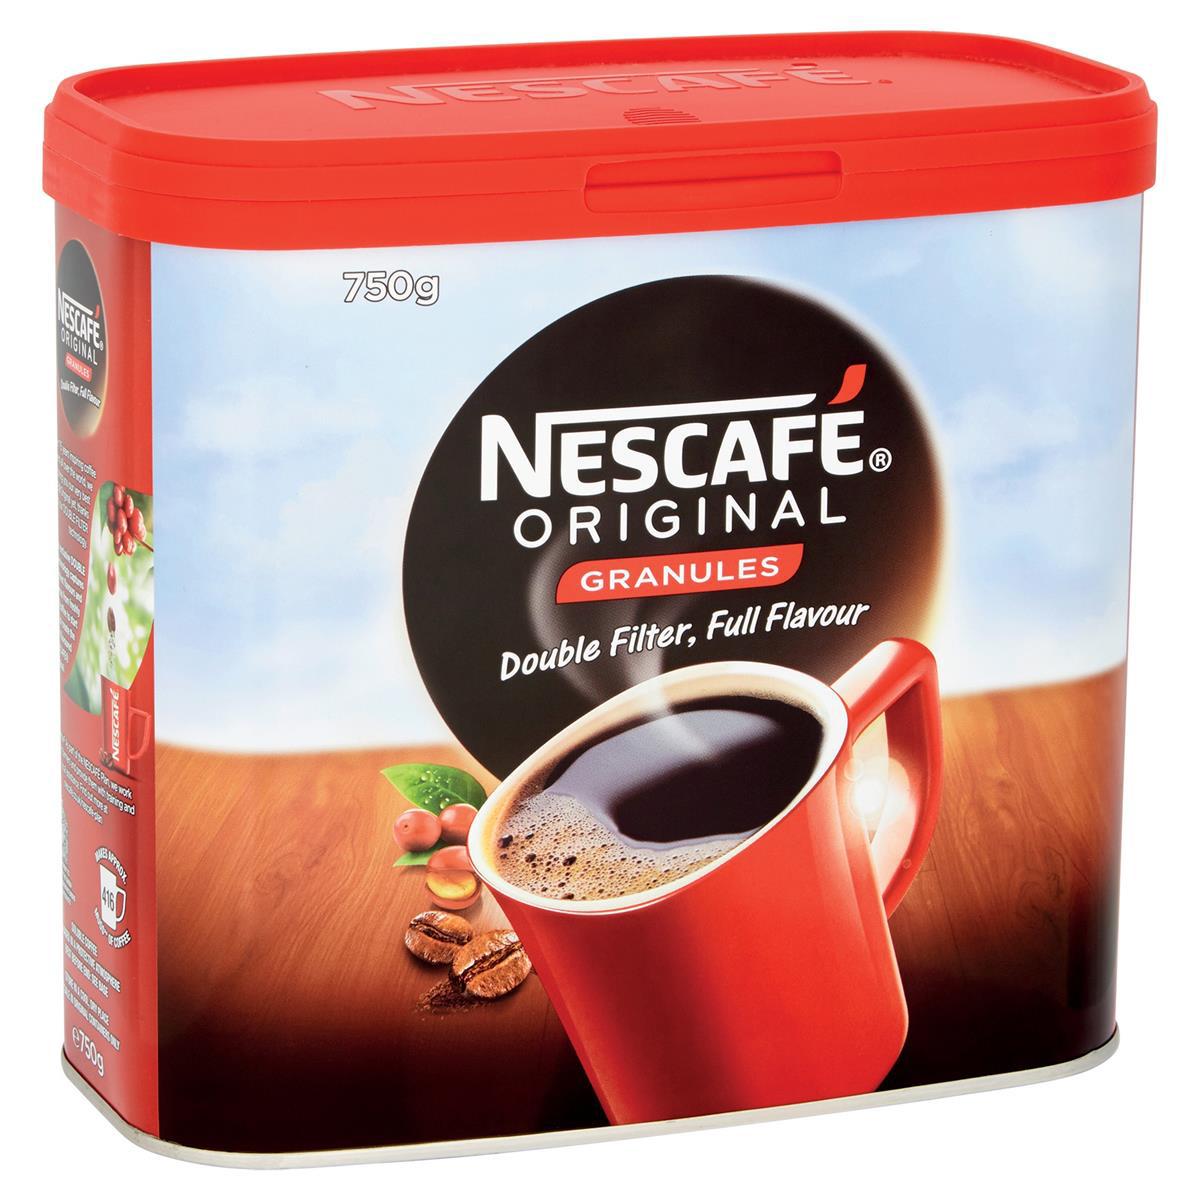 Nescafe Original Coffee Granules Tin 750g Ref 12315566 [Buy 2 Get Kit Kat Senses Chocs 200g] Jan-Mar 2020